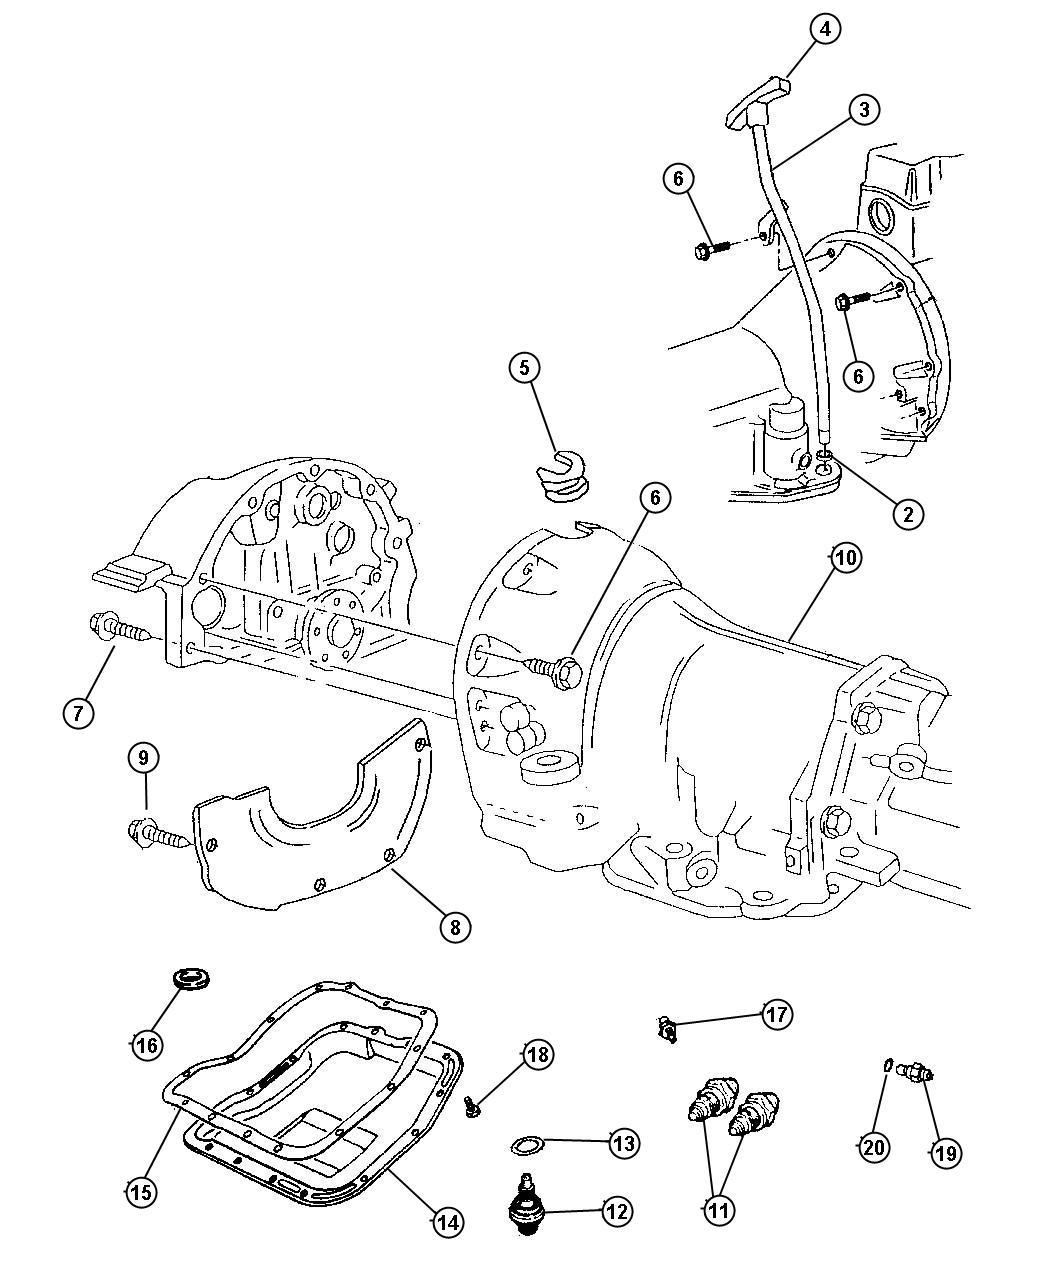 Dodge Durango R T Magnum 5 9l Smpi V8 4 Spd Automatic 46re Case Amp Related Parts Automatic